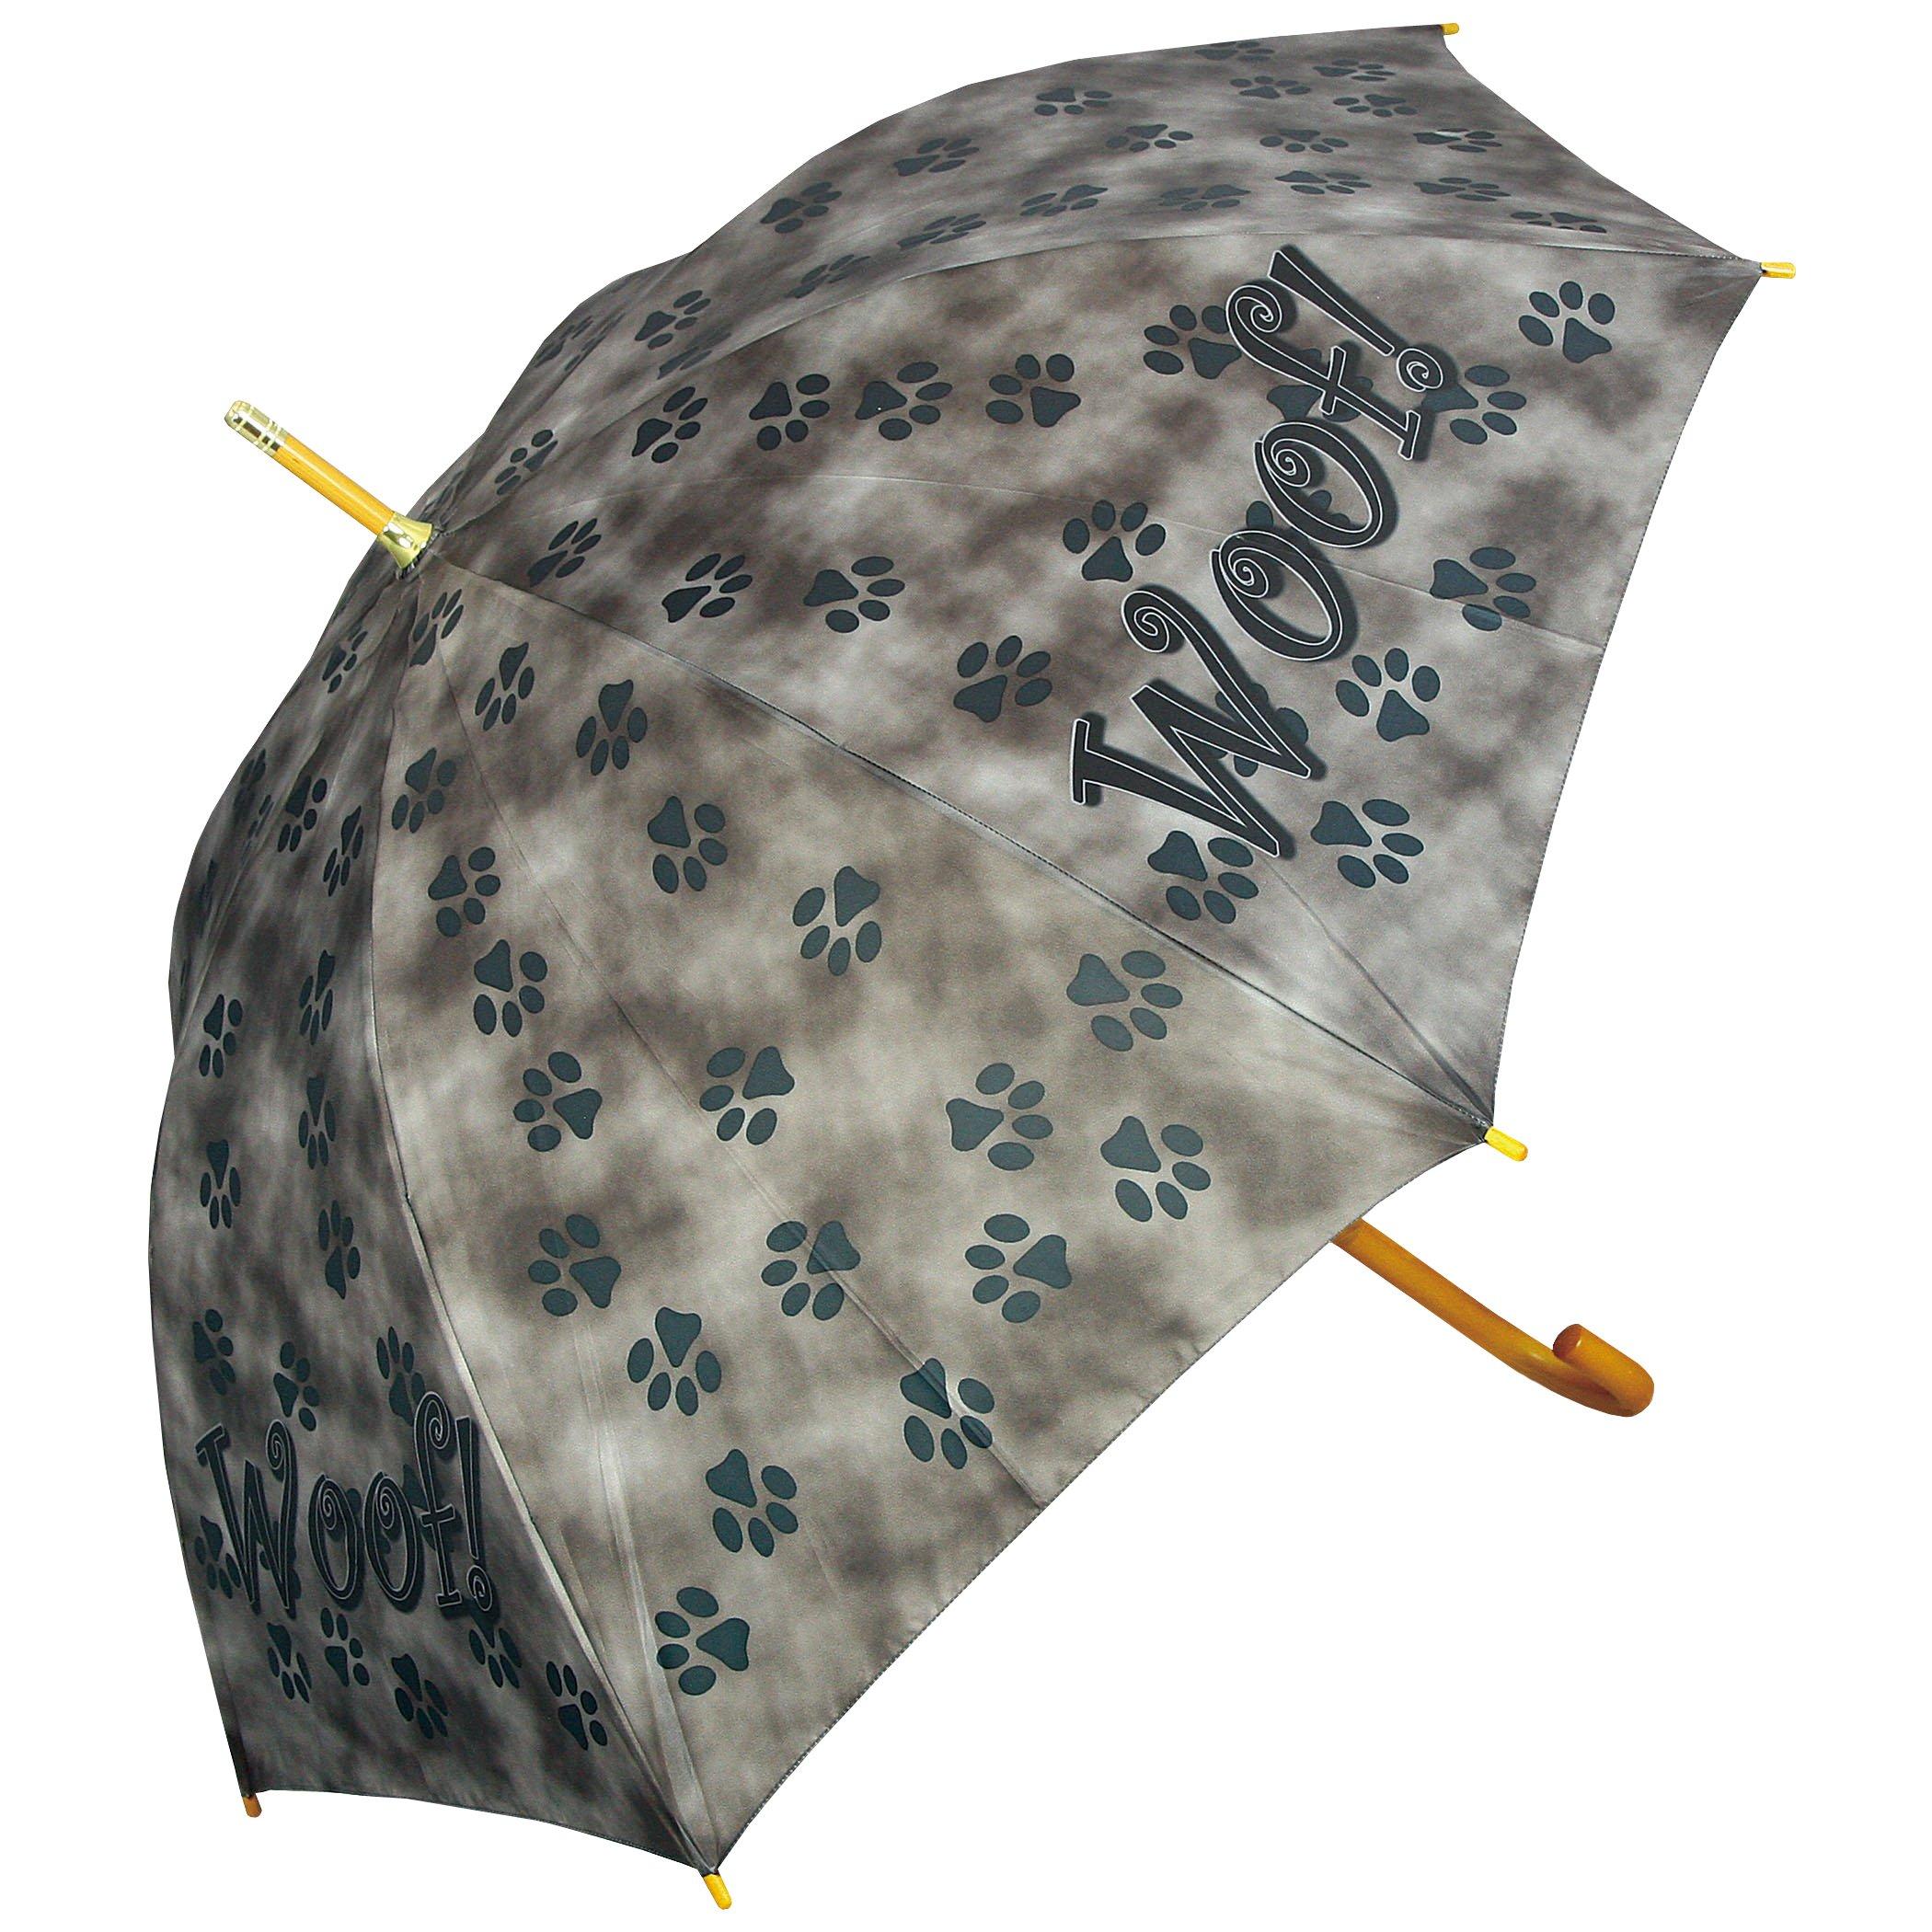 PealRa Dog Woof Umbrella